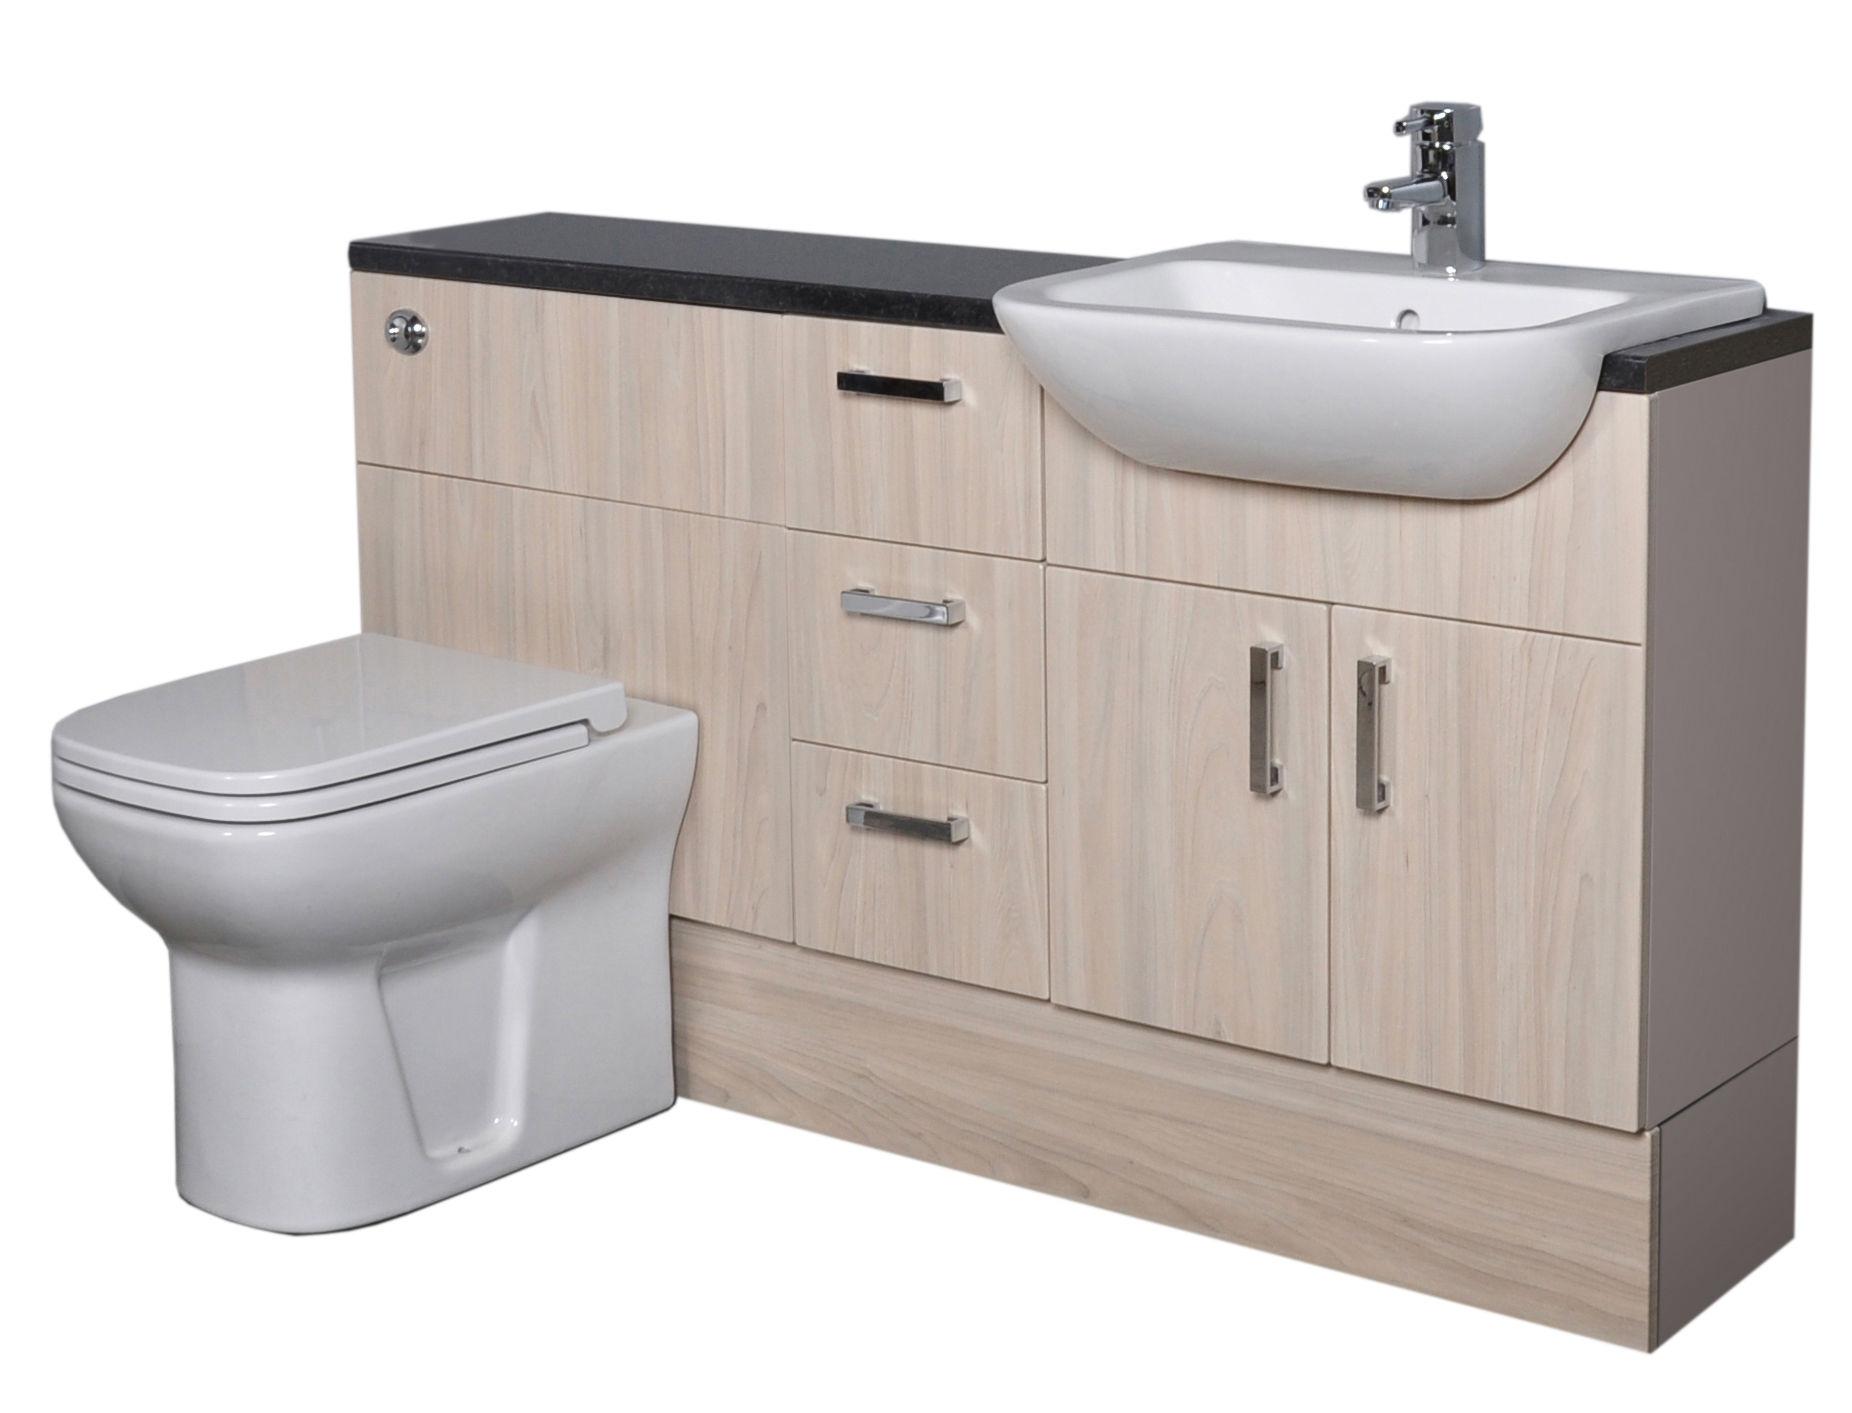 fancy 3 tier bathroom shelf model-Modern 3 Tier Bathroom Shelf Design